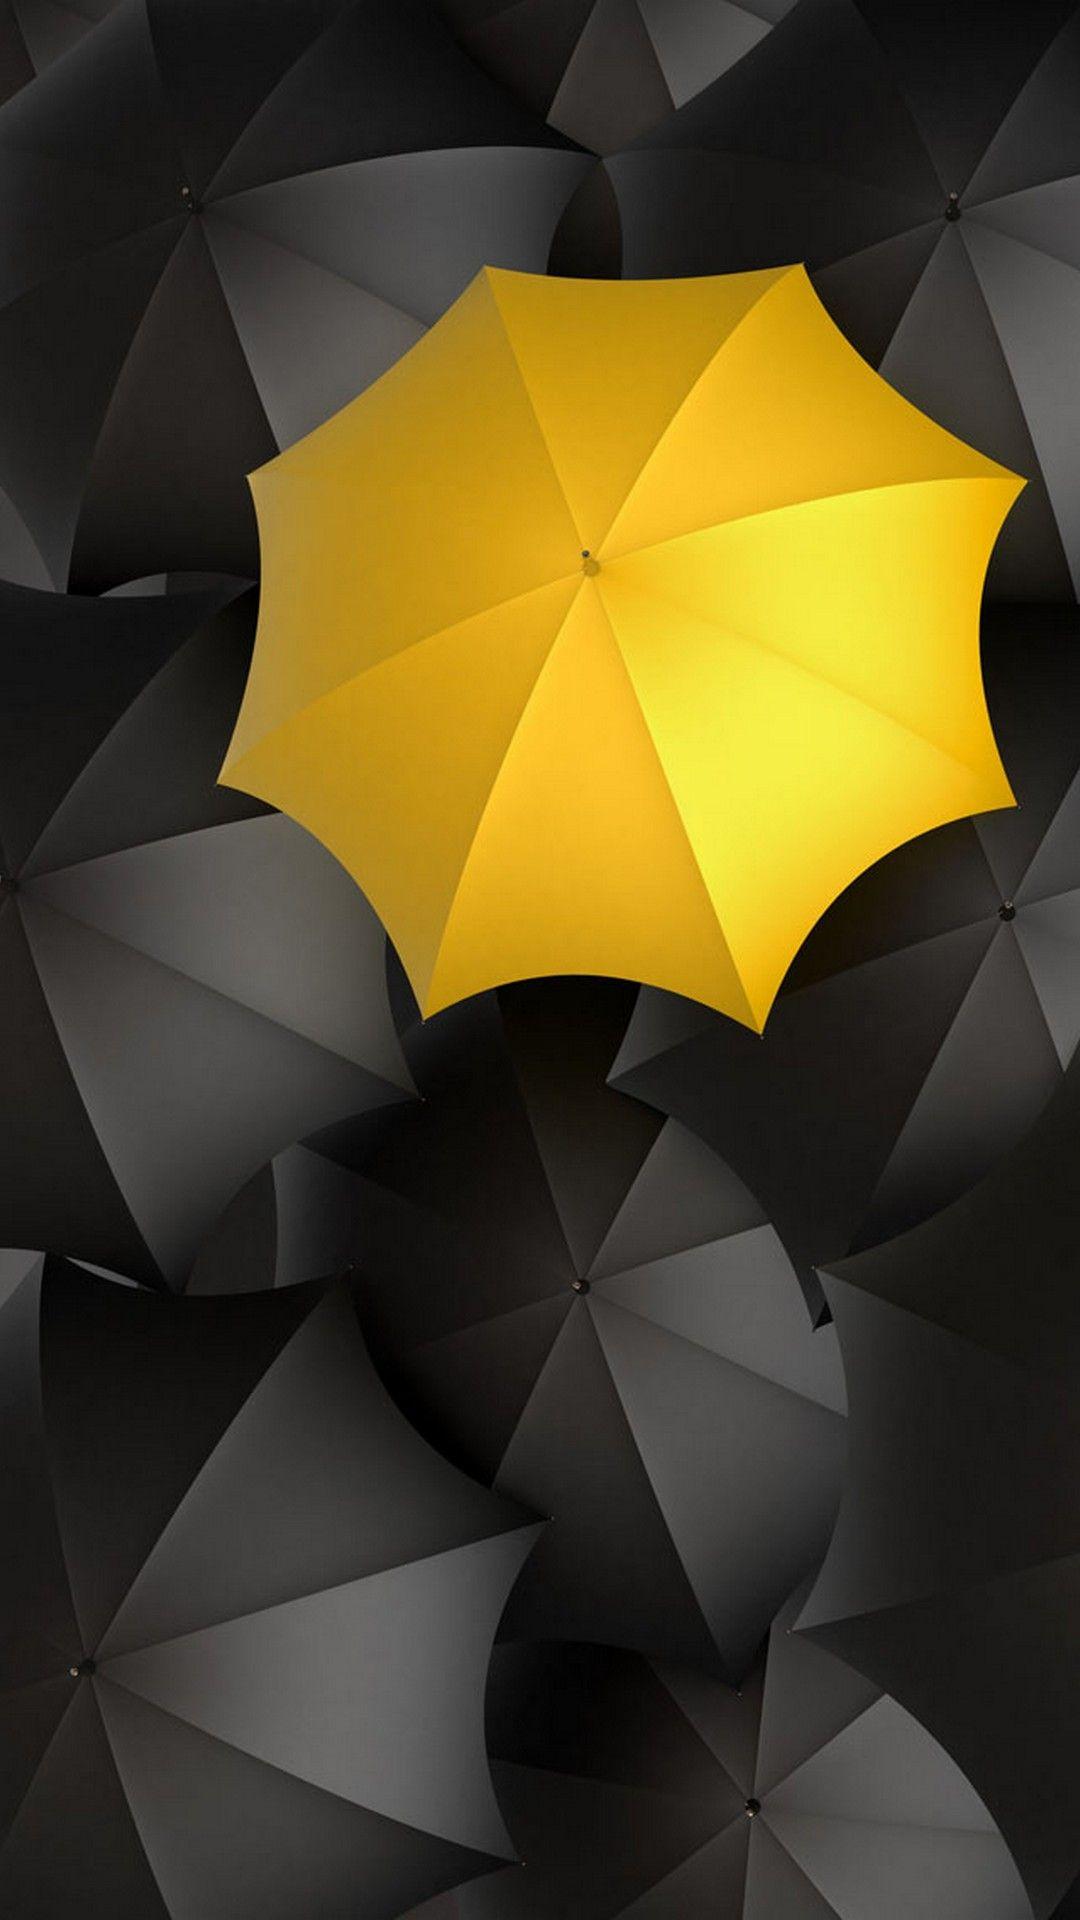 Umbrella Wallpaper Iphone  Best Iphone Wallpaper